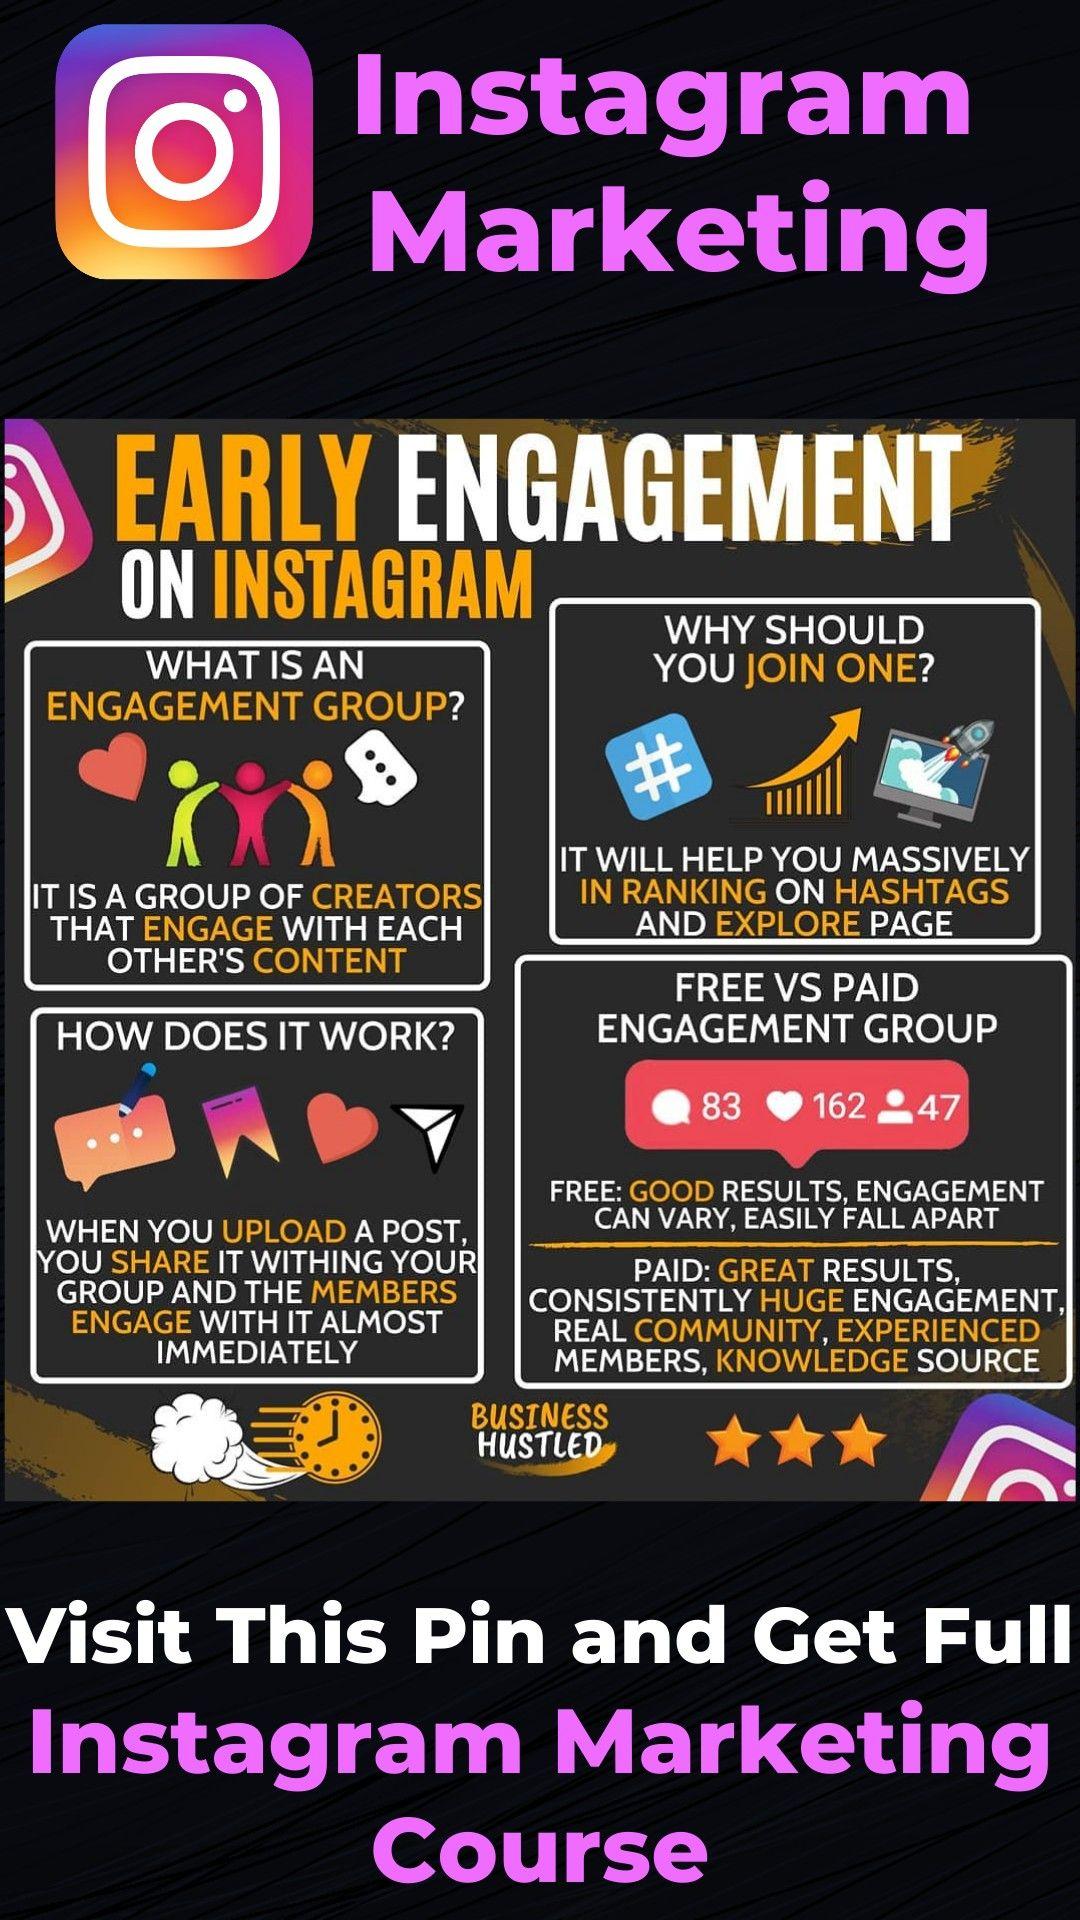 Instagram Engagement Instagram Marketing Social Media Marketing Dig Social Media Marketing Business Instagram Marketing Tips Marketing Strategy Social Media